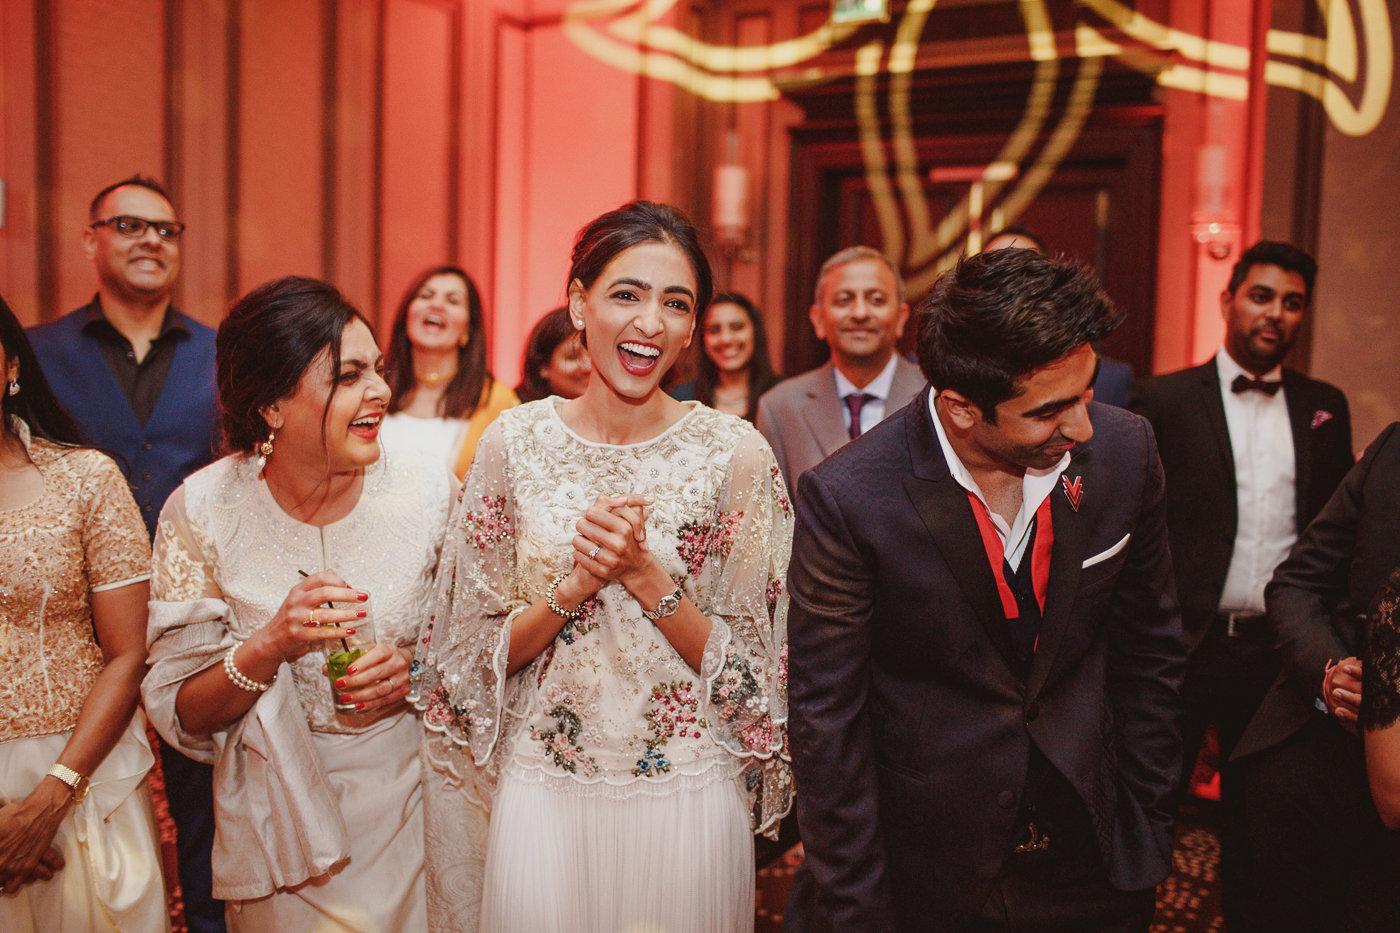 rosewood-hotel-wedding-photographer-28.jpg